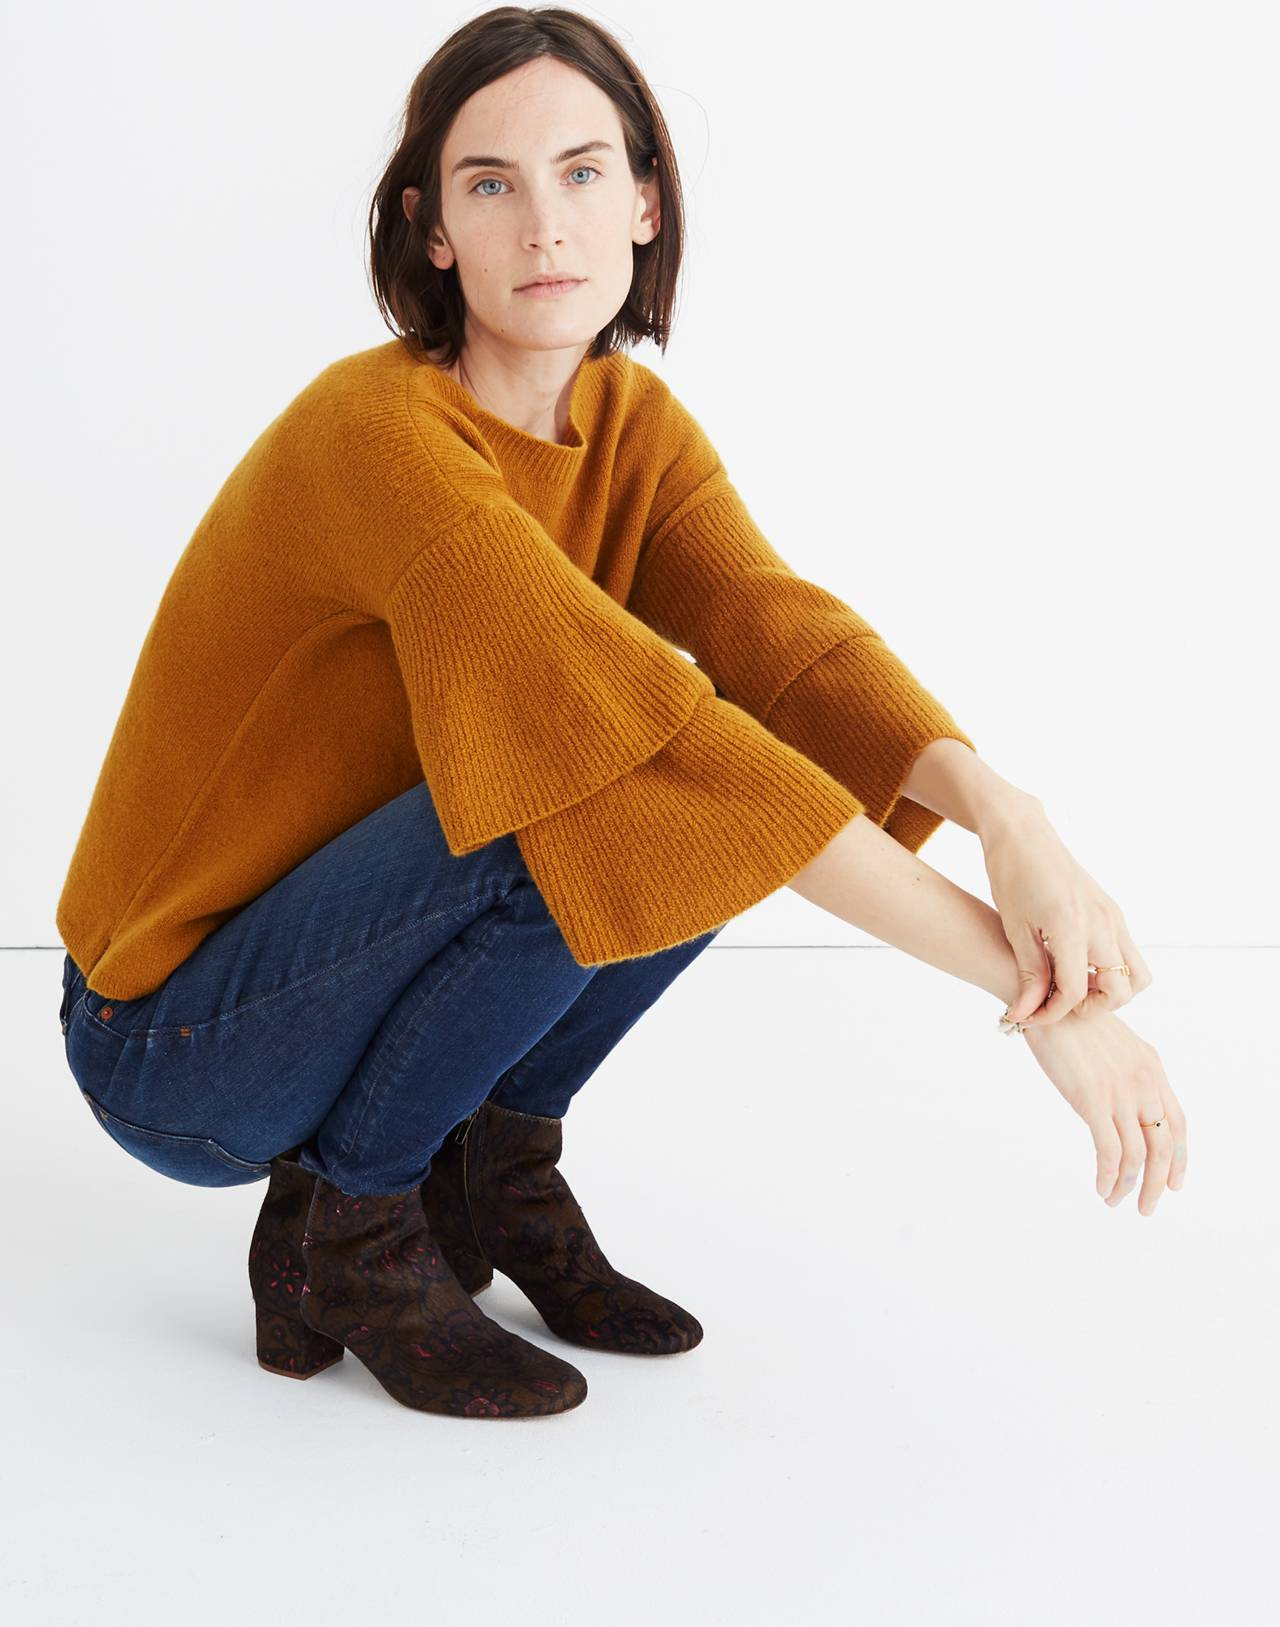 Tier-Sleeve Pullover Sweater in Coziest Yarn in golden harvest image 2